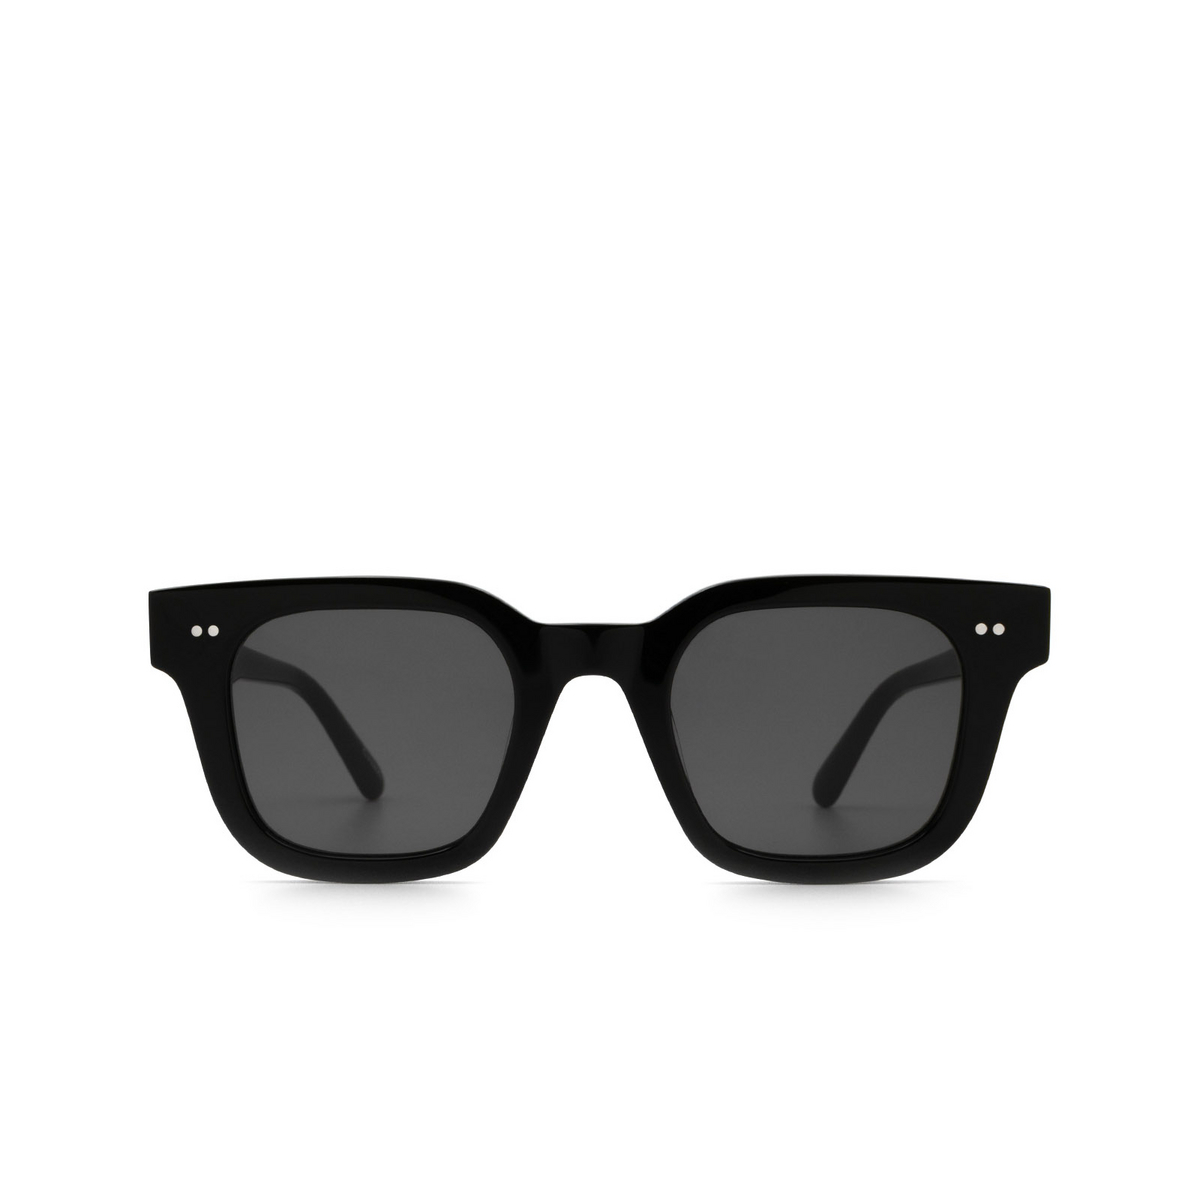 Chimi® Square Sunglasses: 04 color Black - front view.